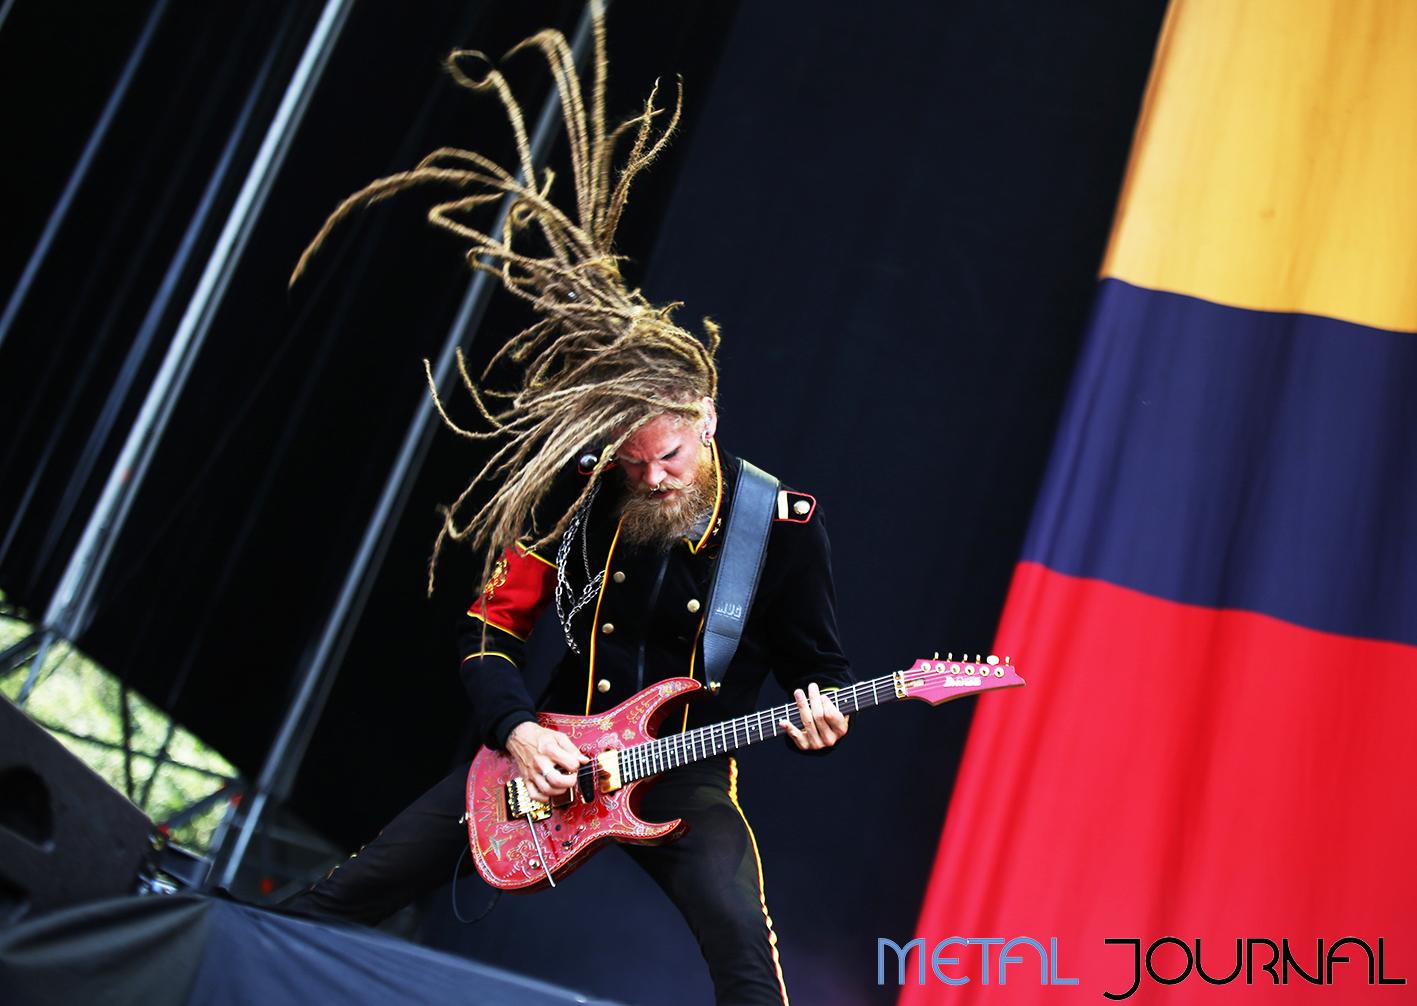 avatar - metal journal rock fest barcelona 2019 pic 4